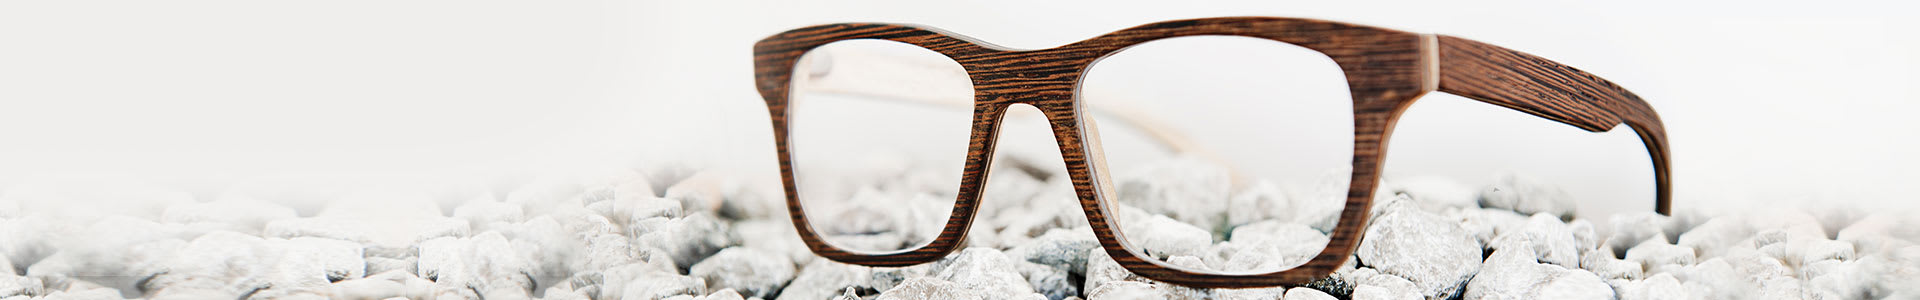 Wood Glasses Frames